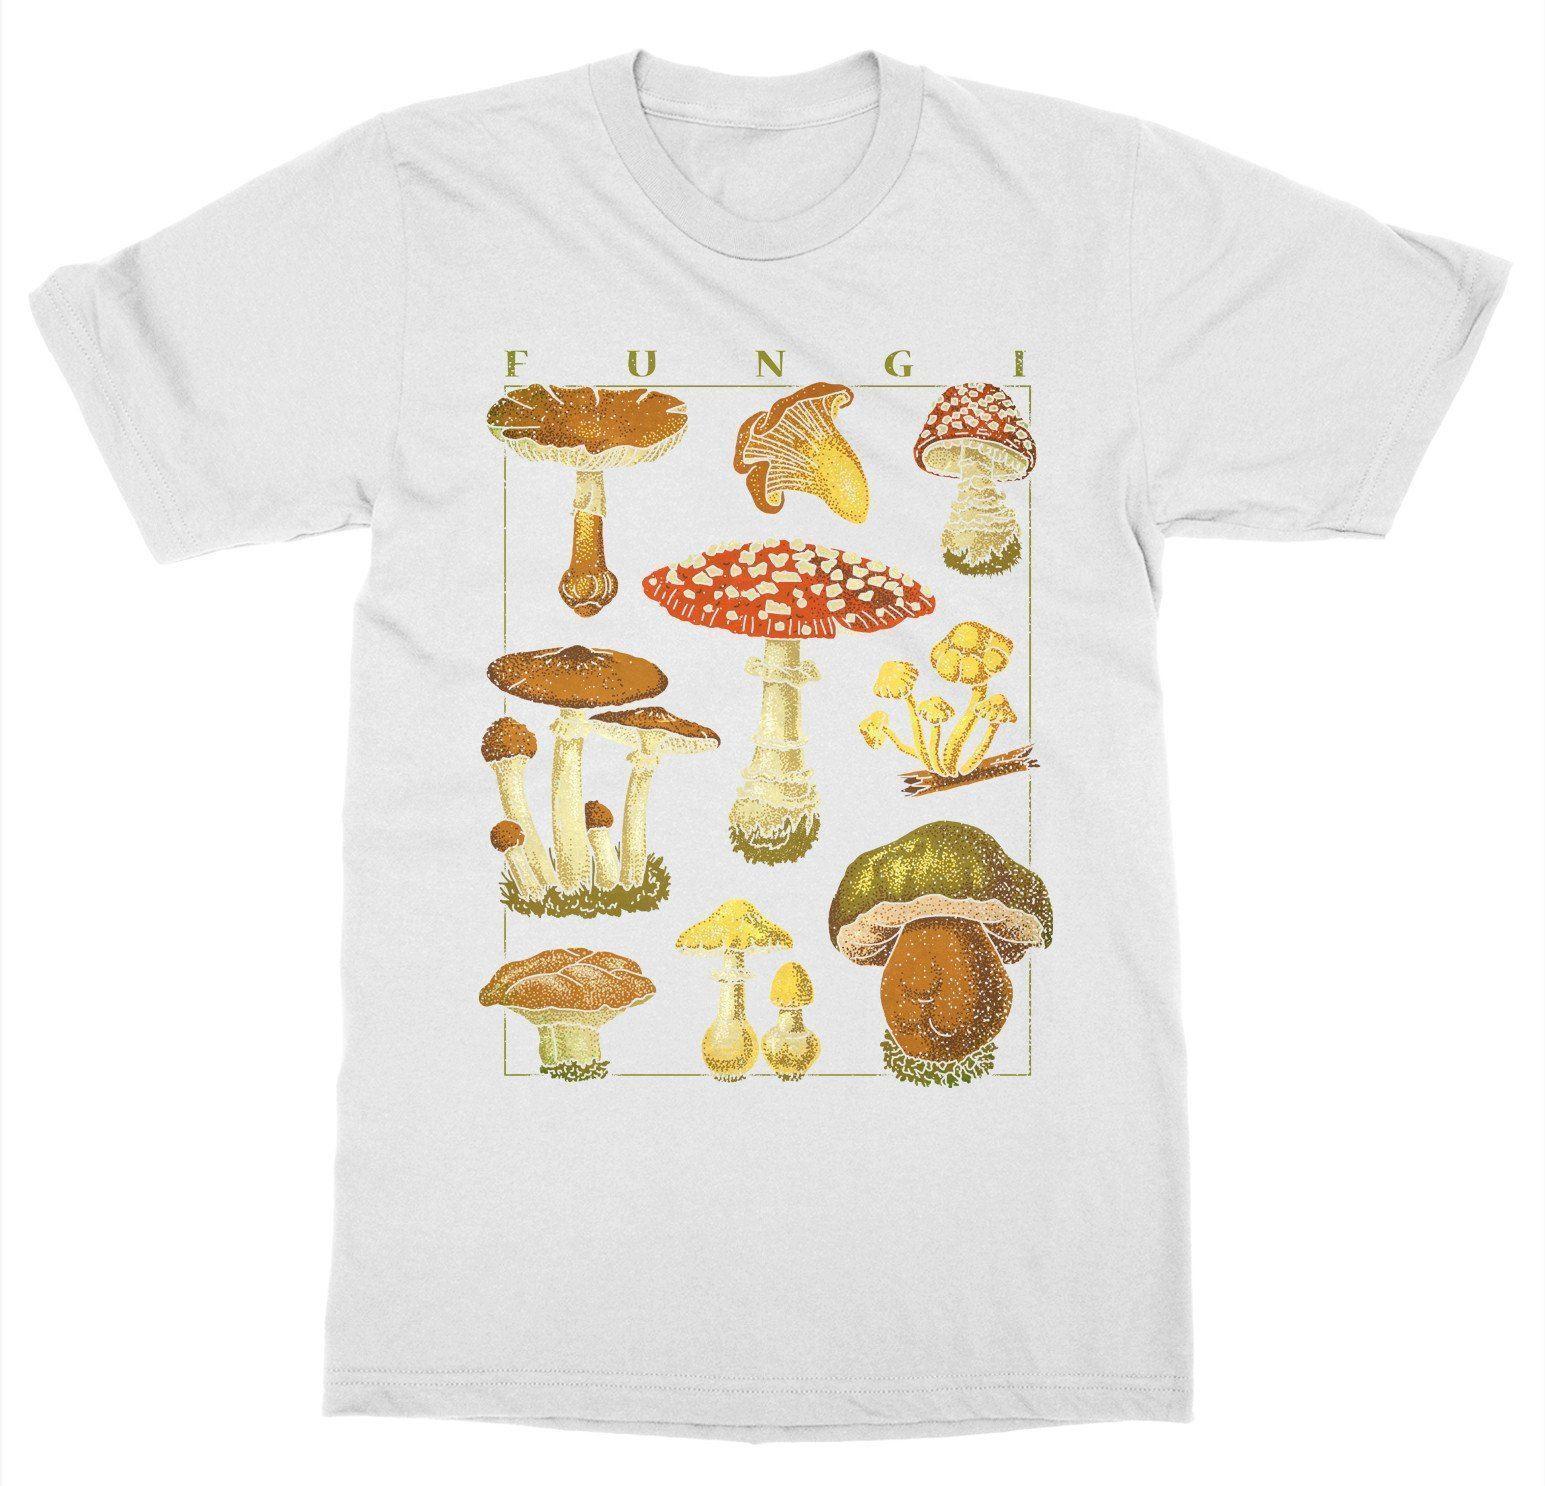 e1ff118b7 Short Sleeve For Men Clothing Summer Mushrooms T Shirt Funghi Fungus  Botanical Garden Plant Print Art Fruit Flower Tee Shirt That T Shirt But T  Shirts From ...